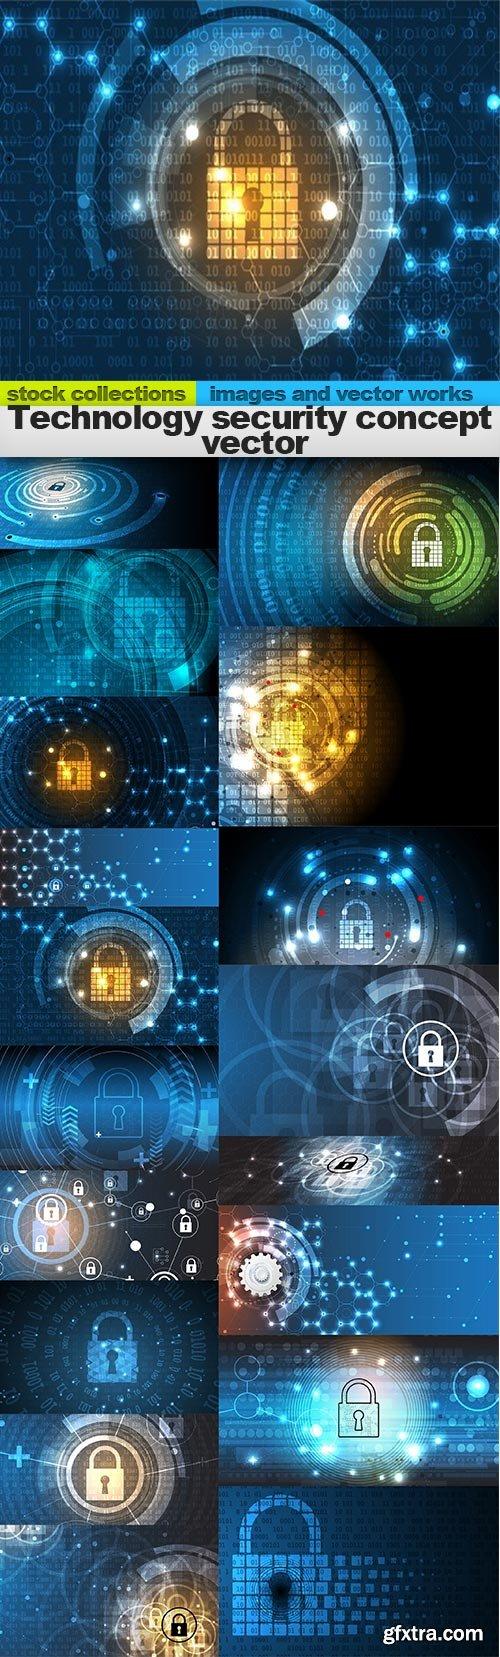 Technology security concept vector, 18 x EPS